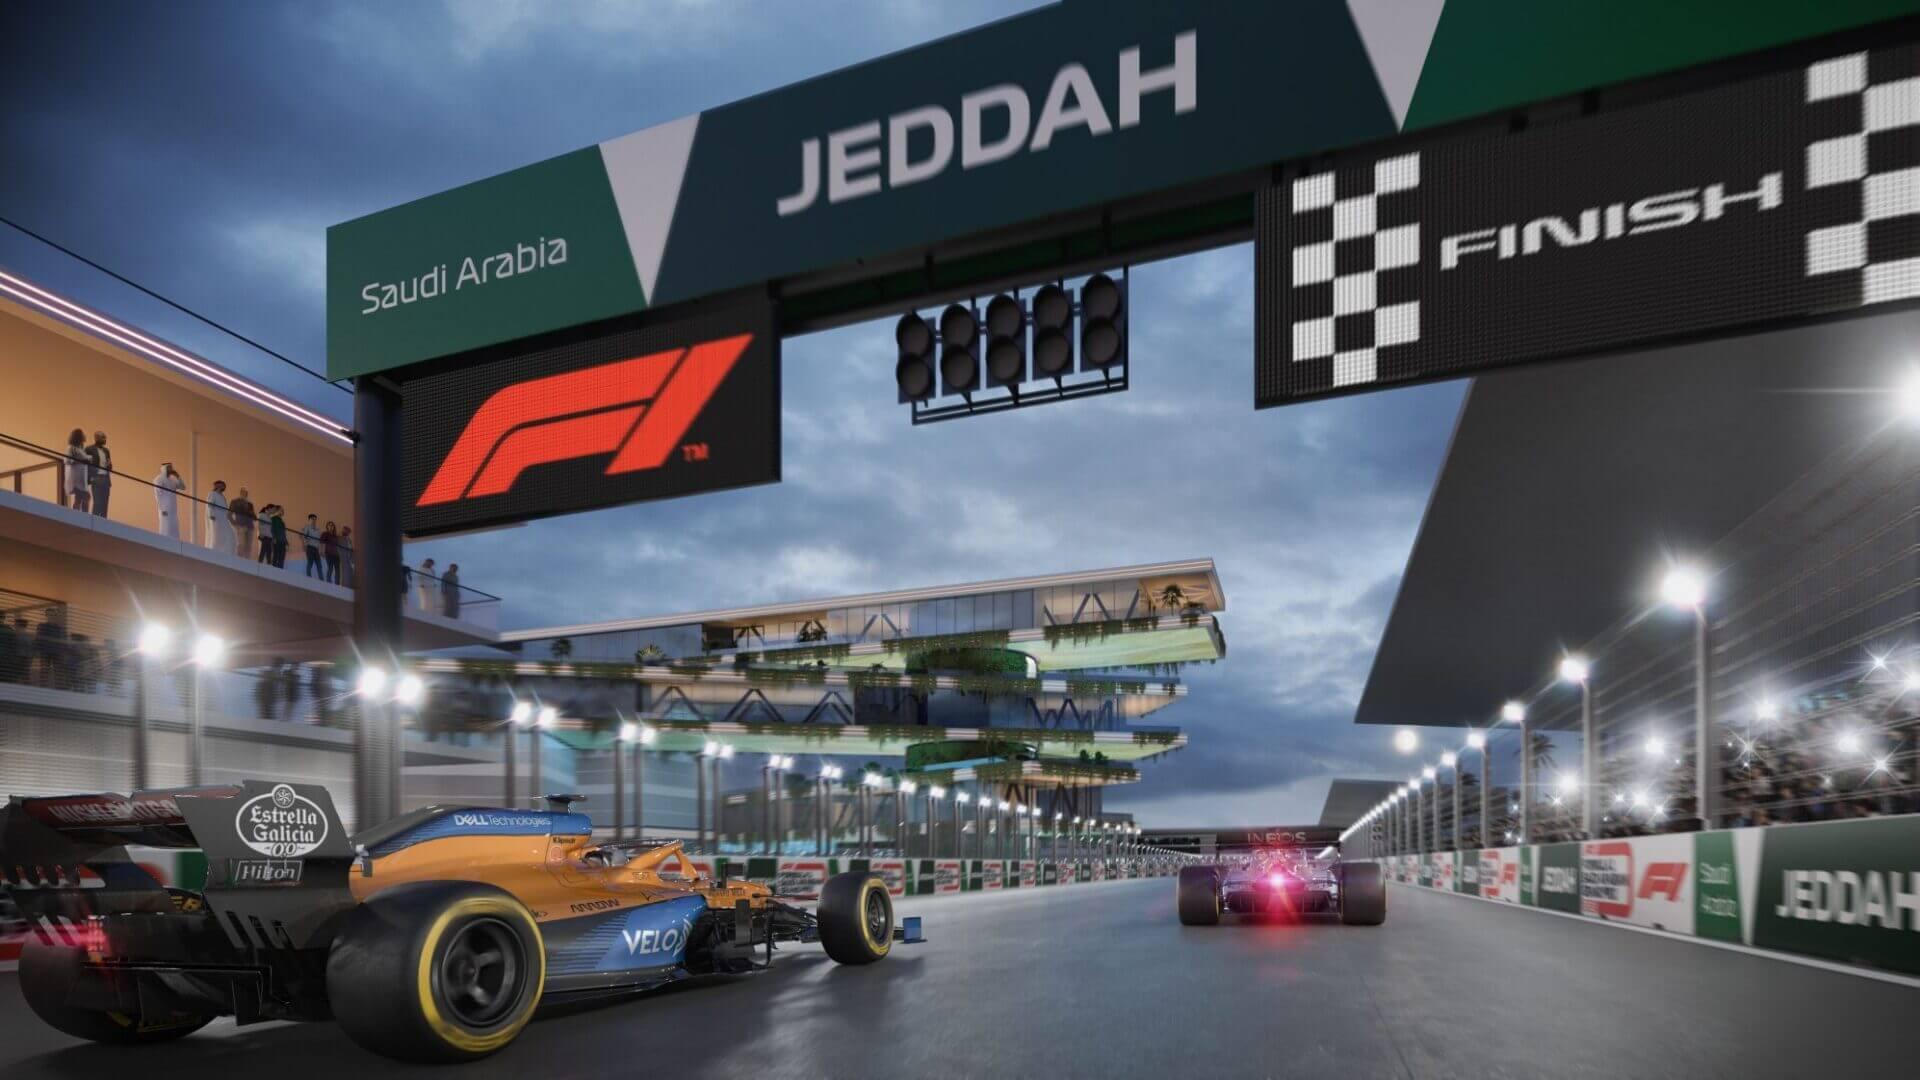 jeddah-street-circuit-20210318.jpg